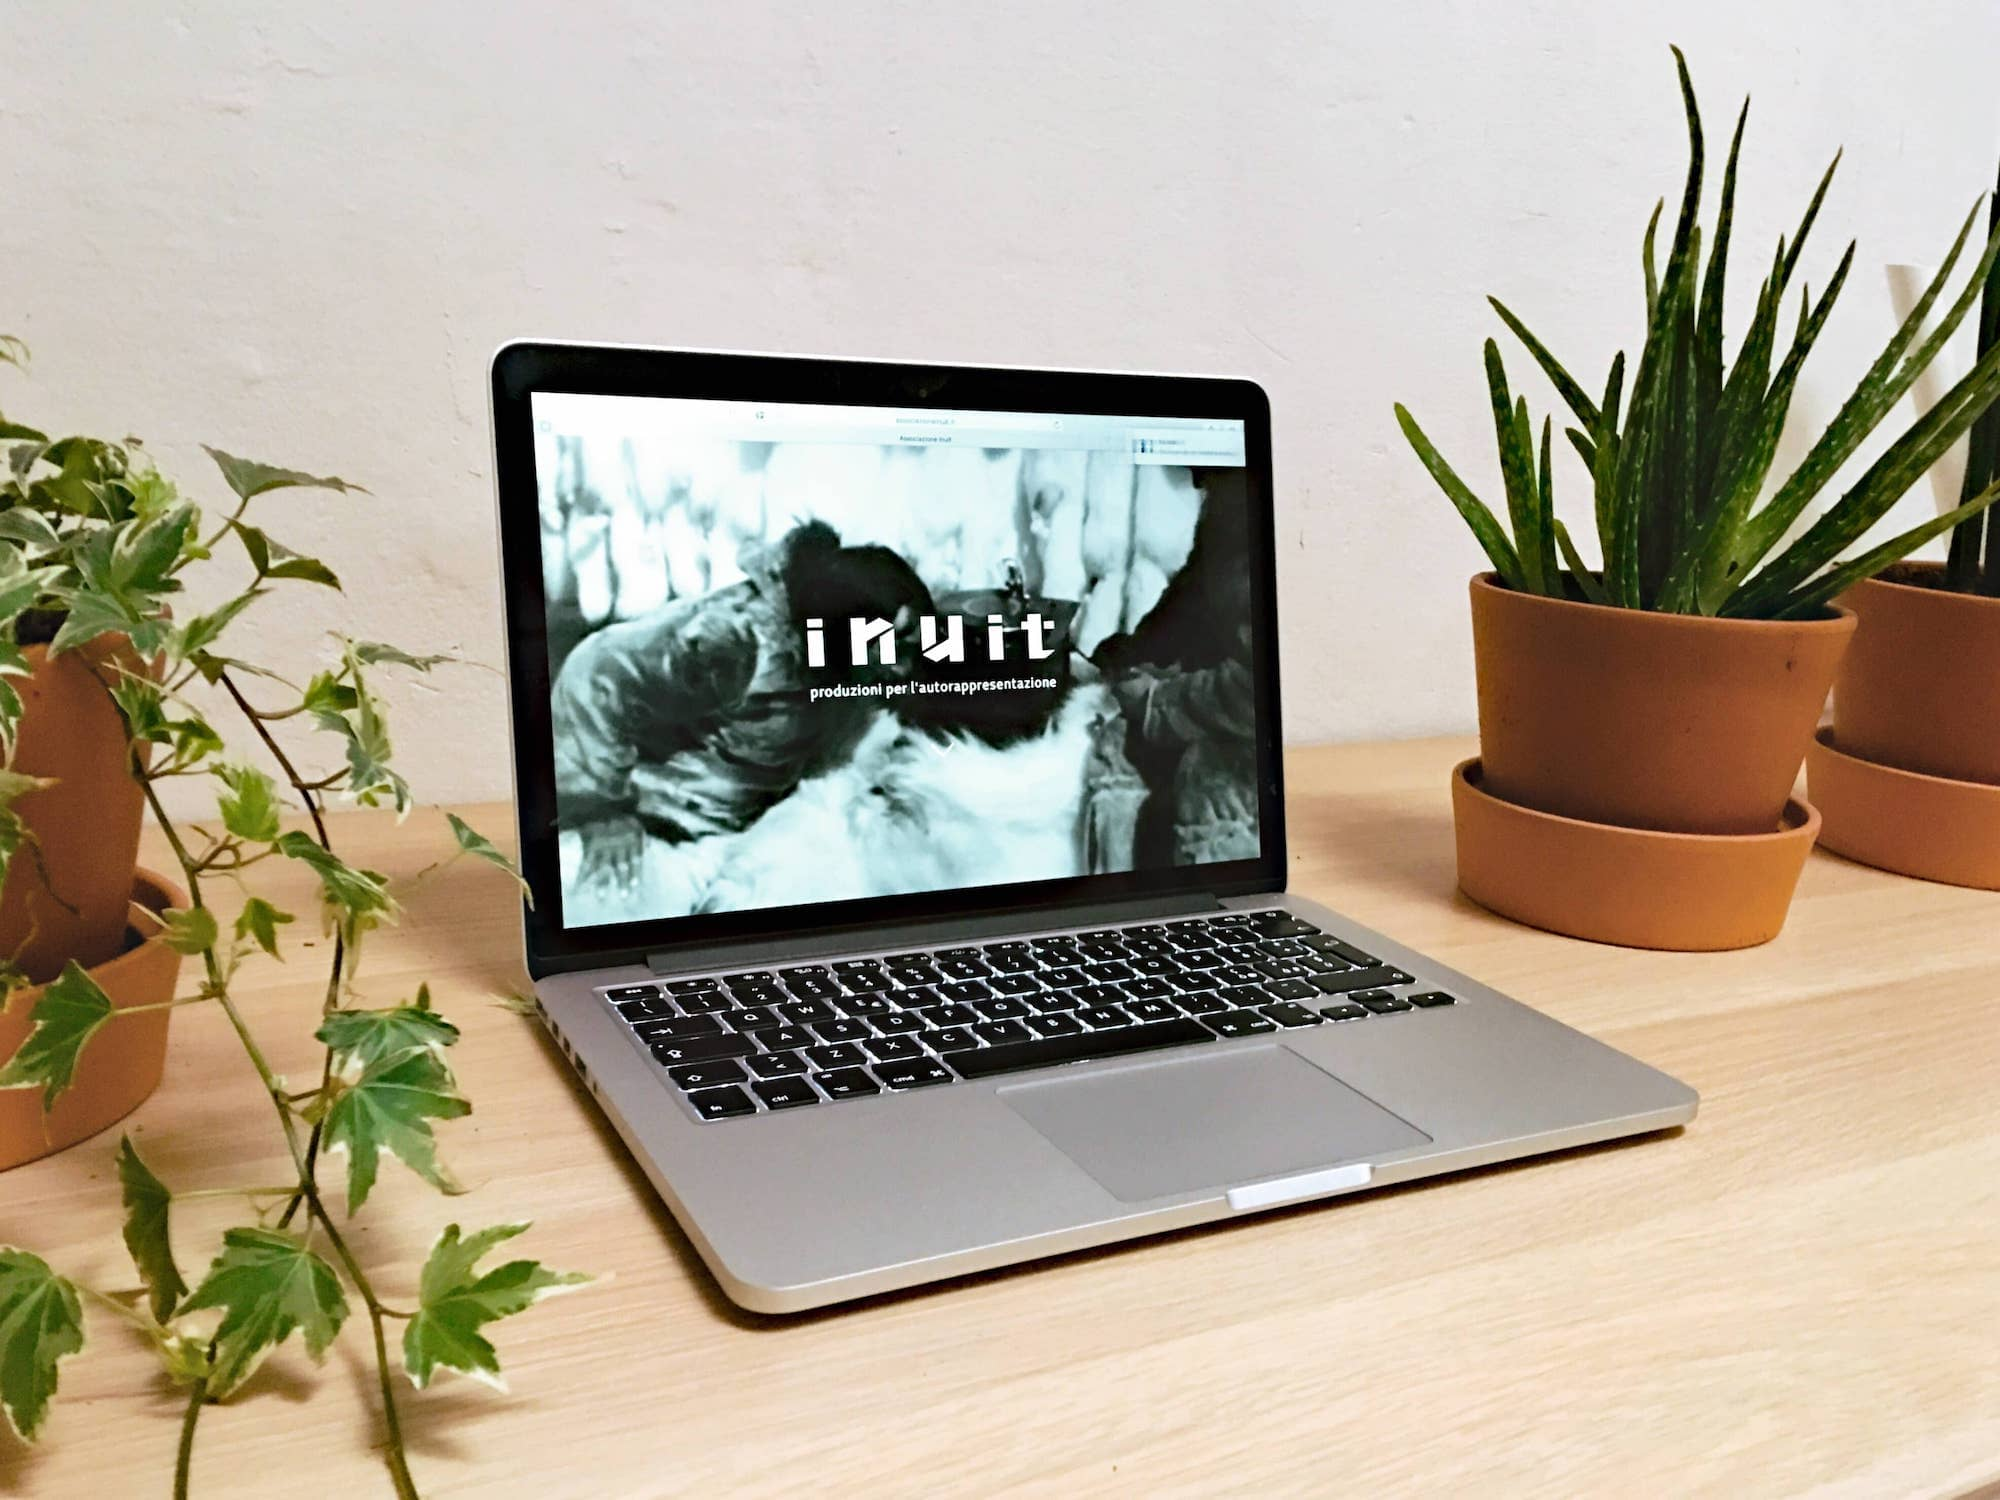 Sito internet di Associazione Inuit - Versione Mobile